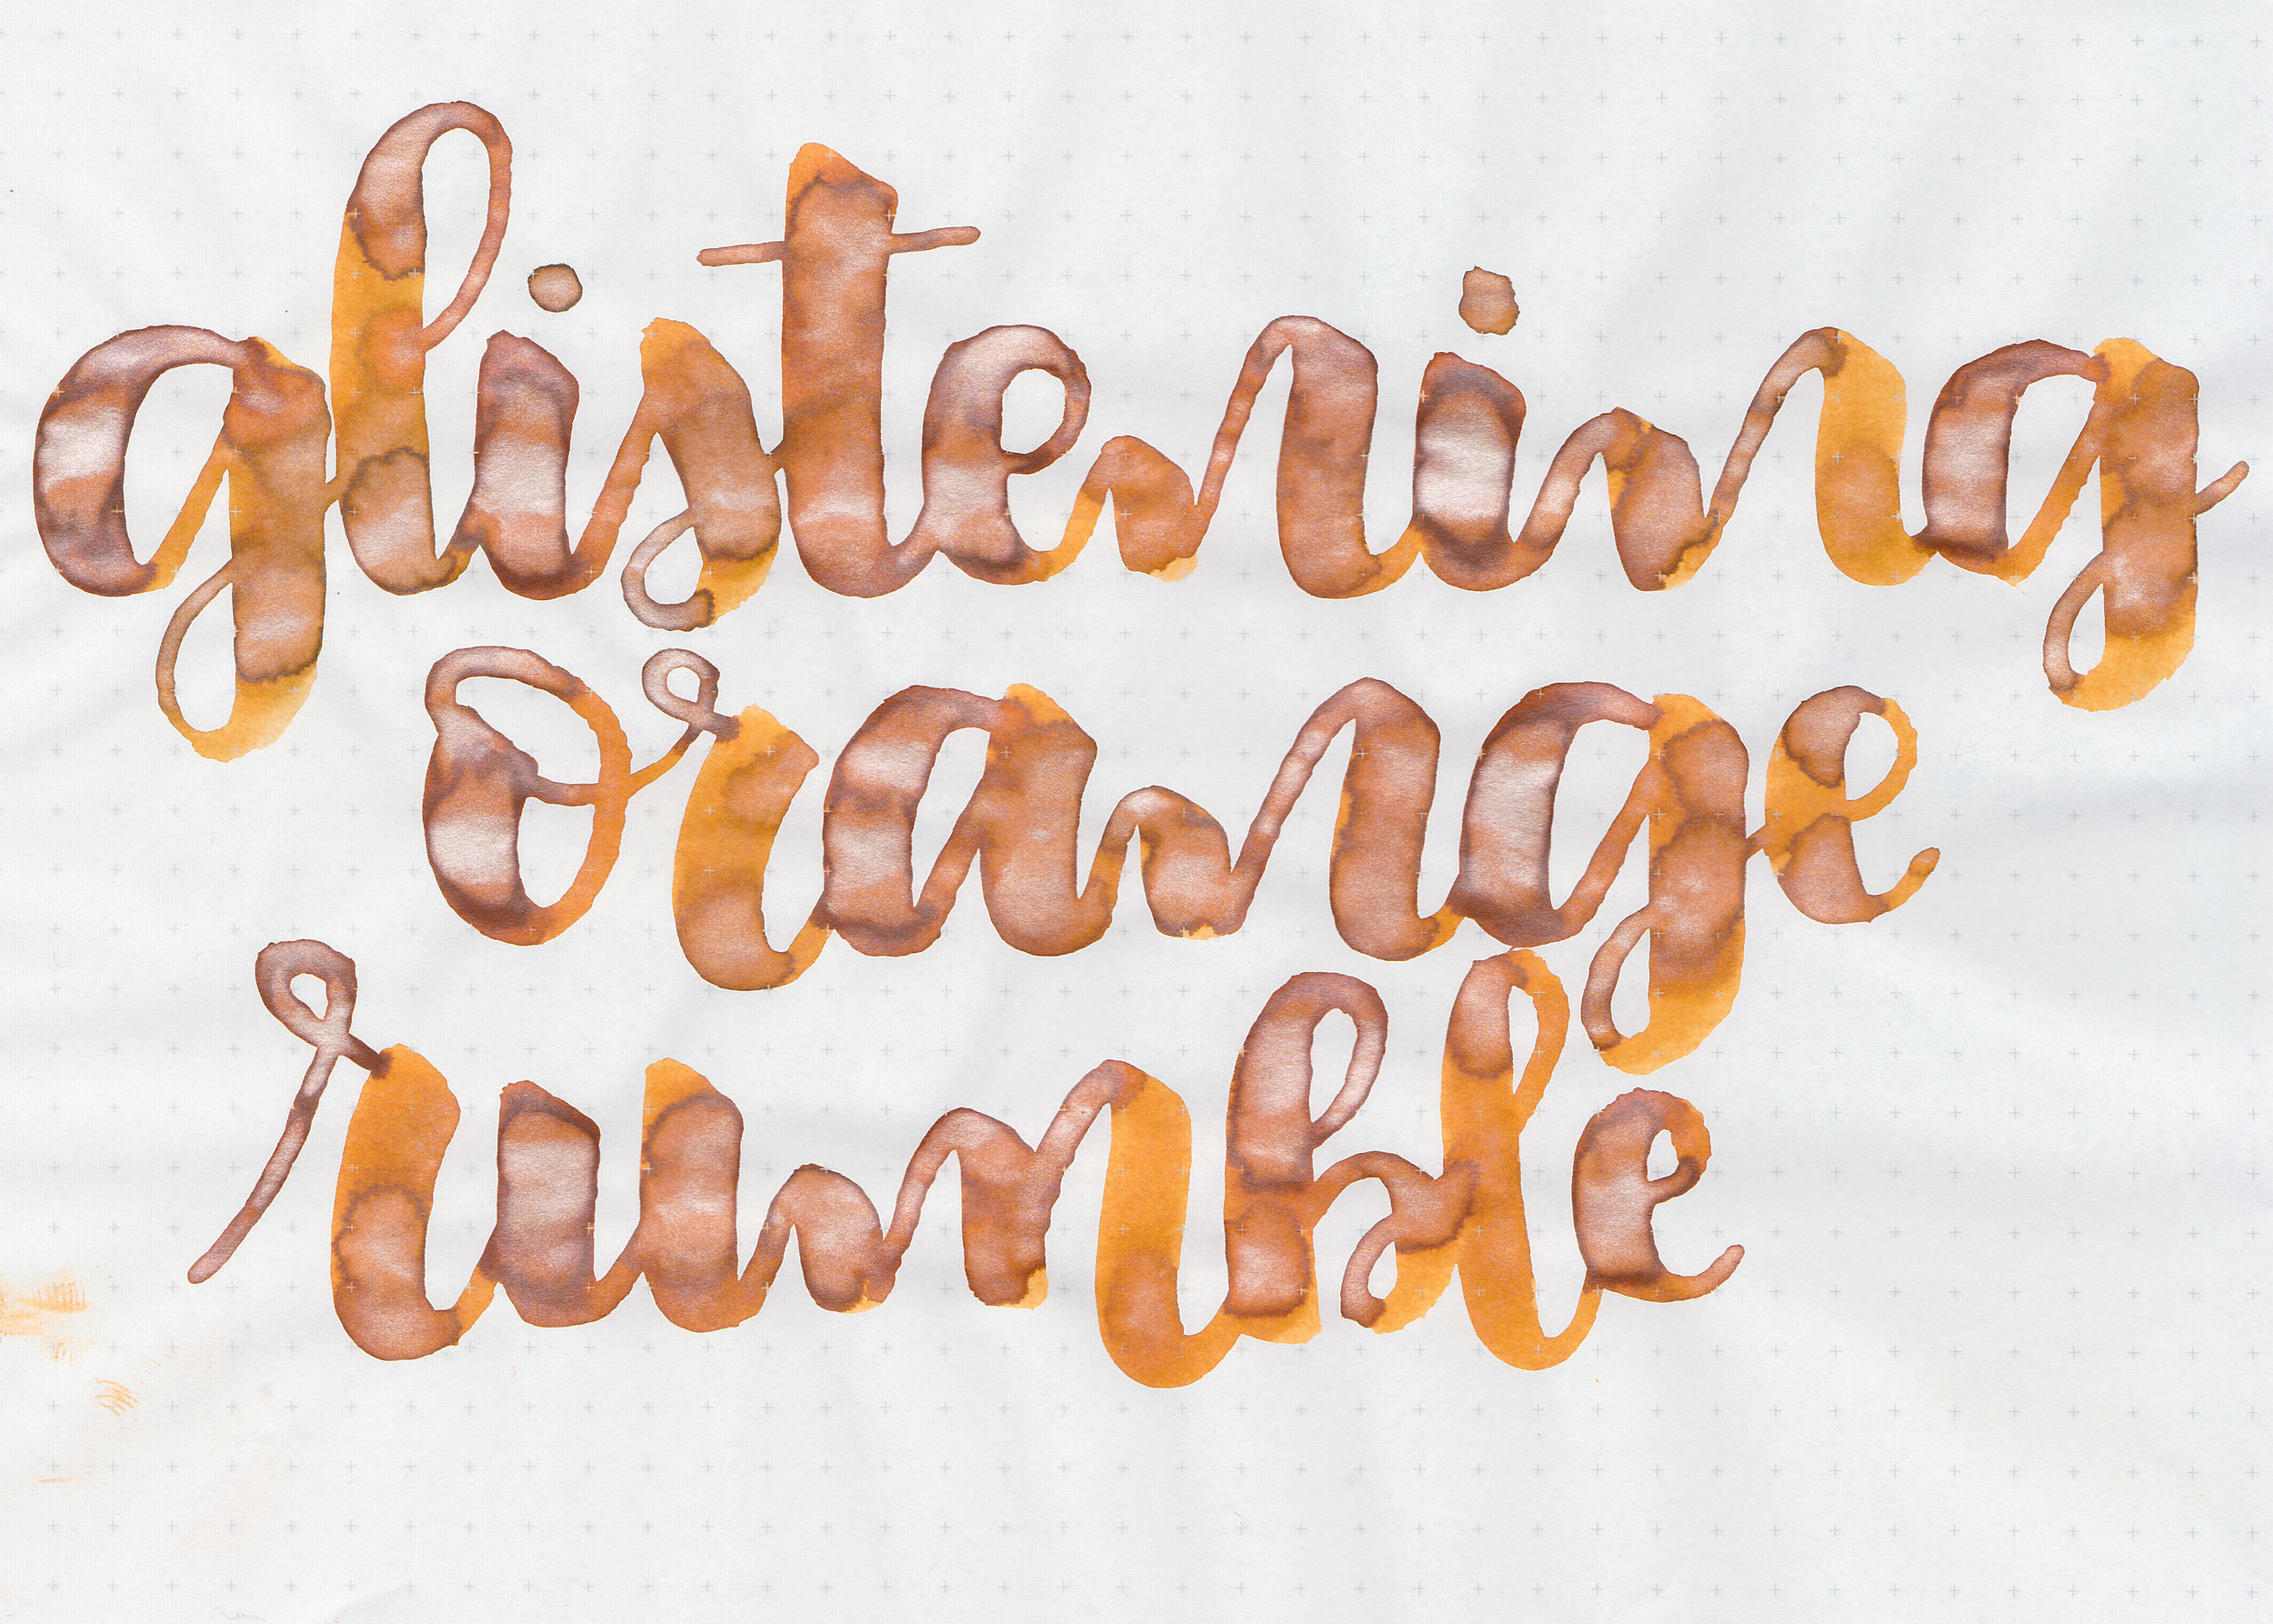 ro-glistening-orange-rumble-2.jpg